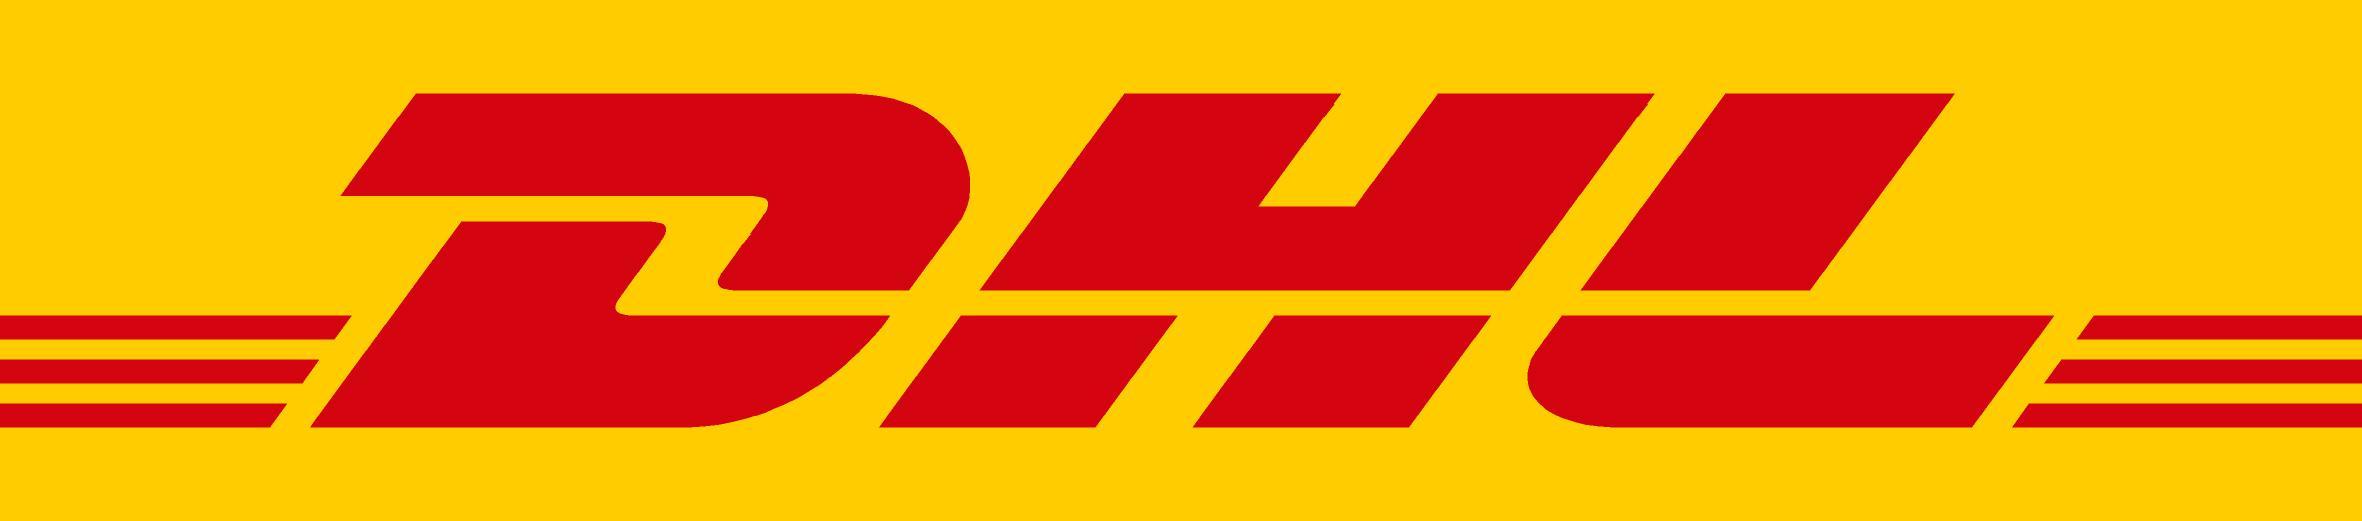 DHL_RGB.jpg